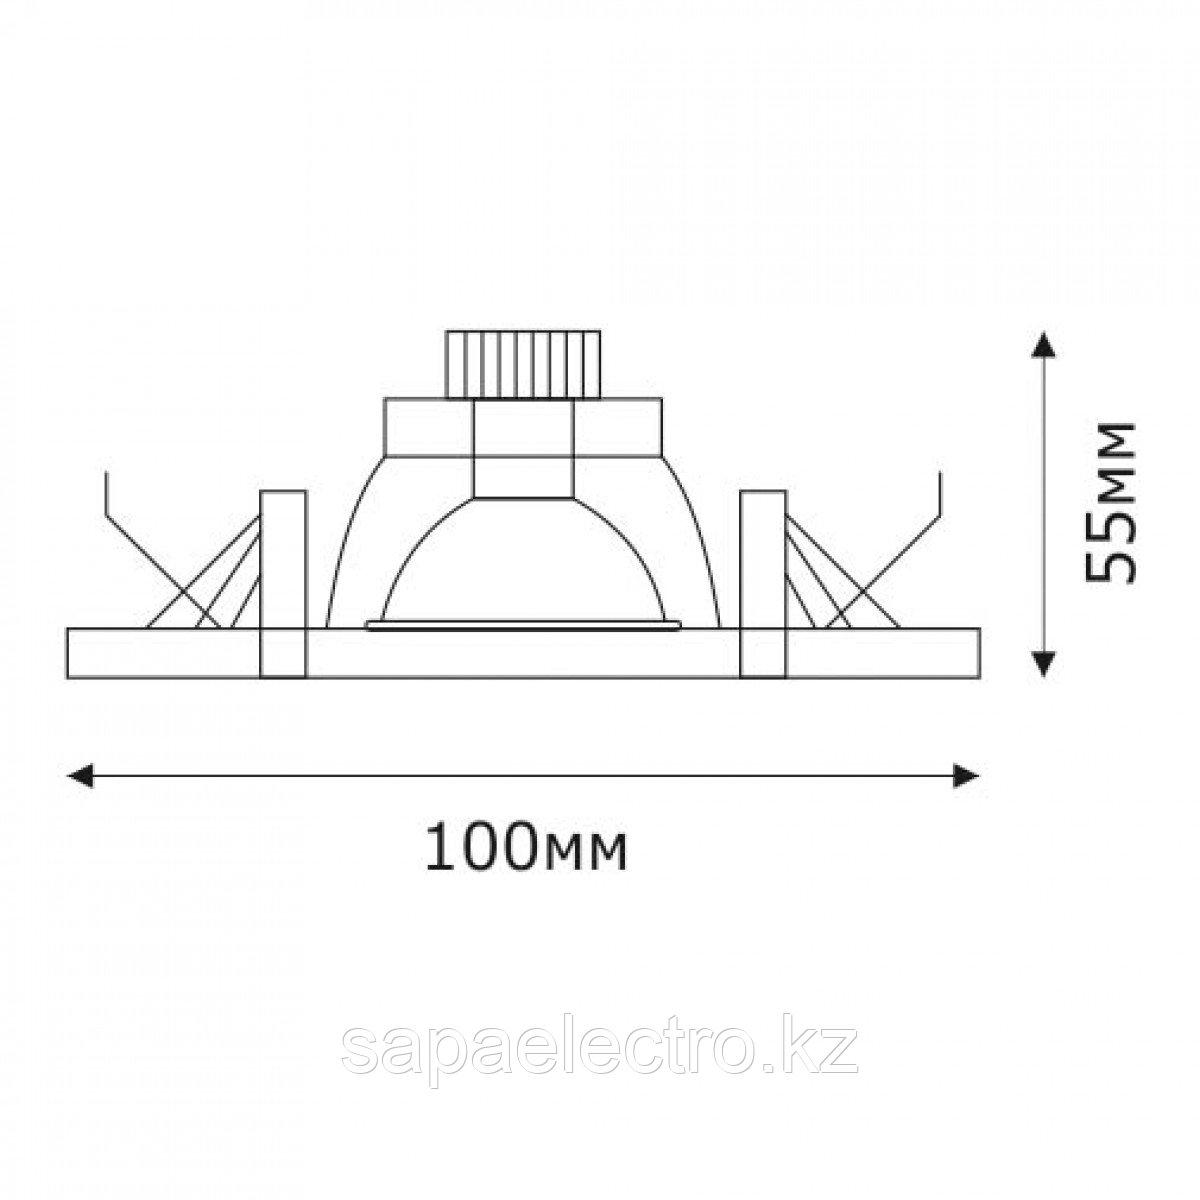 Спот LED QZFG-02 ROUND 3W 5000K (TS) 60шт